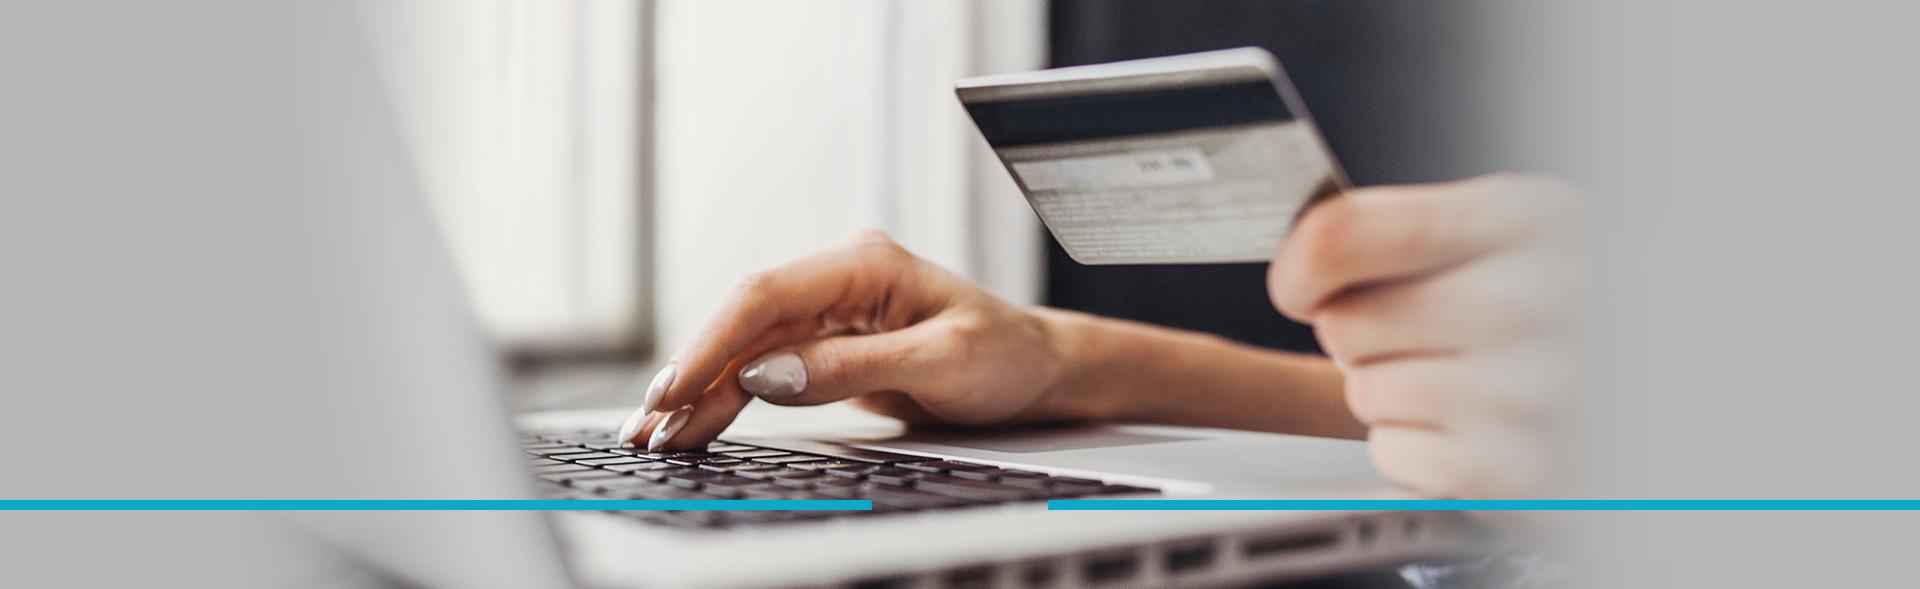 Online Payment Policies